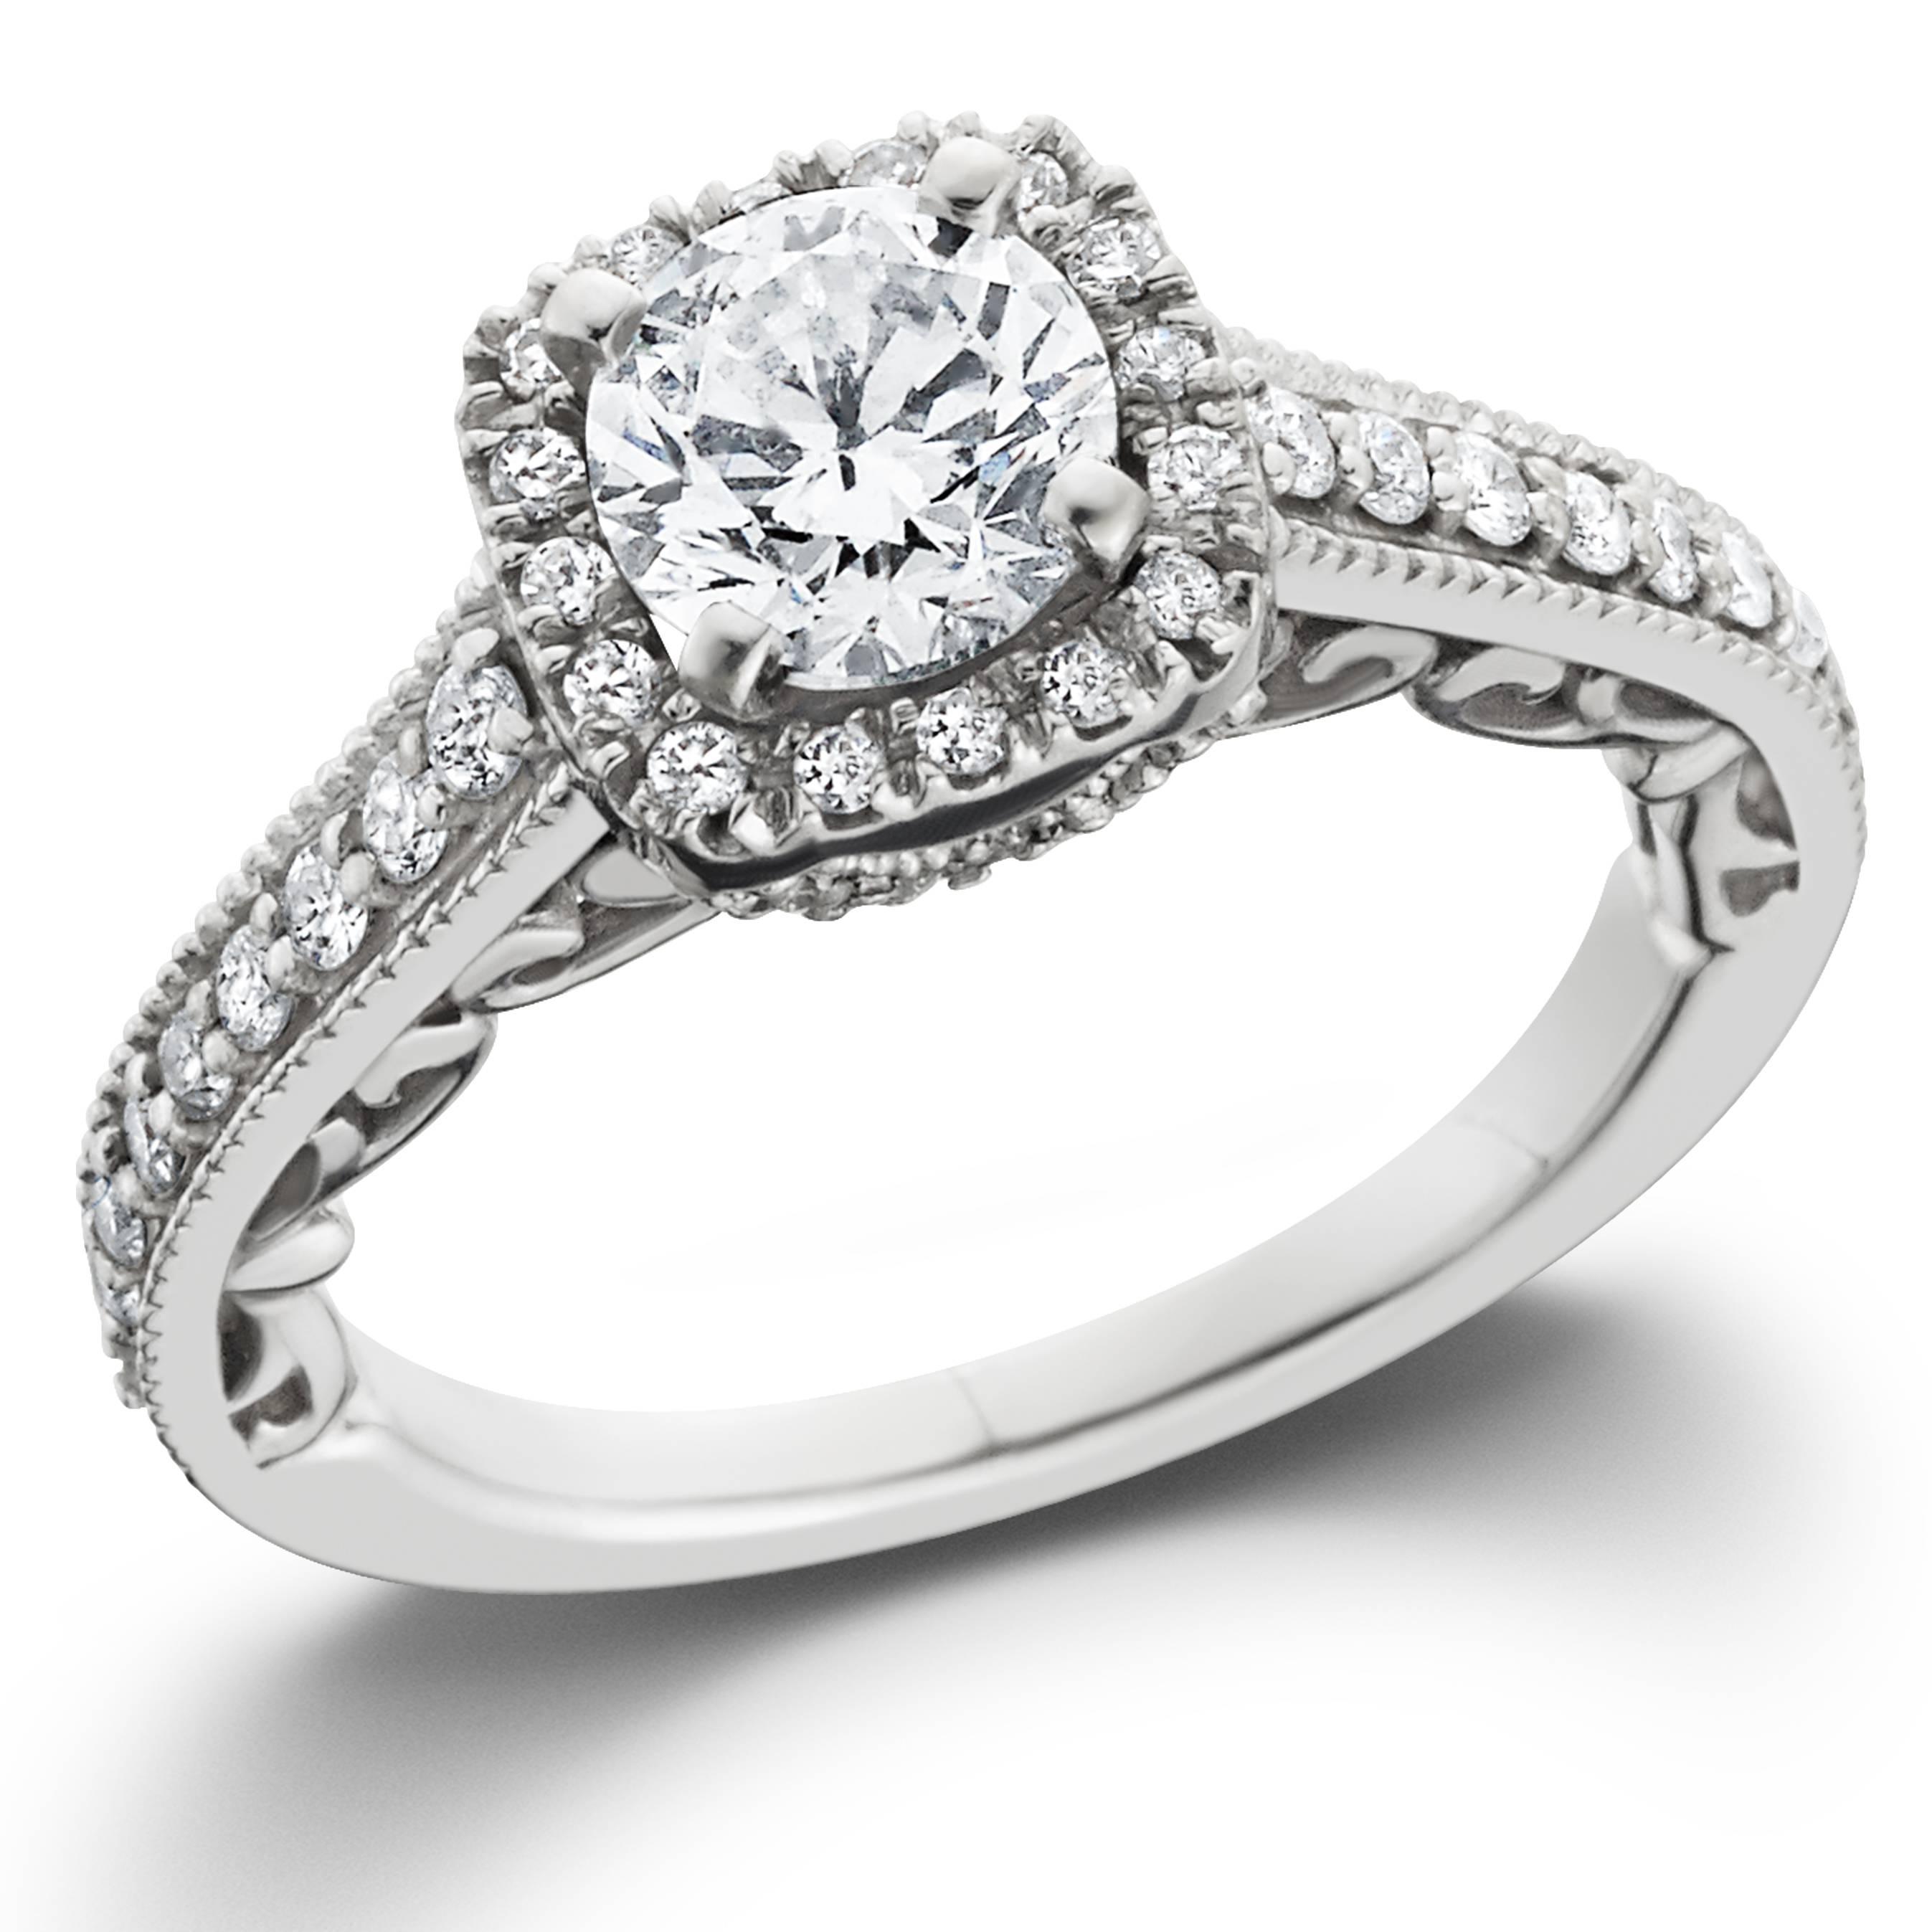 7 8ct cushion diamond vintage halo engagement ring 14k. Black Bedroom Furniture Sets. Home Design Ideas